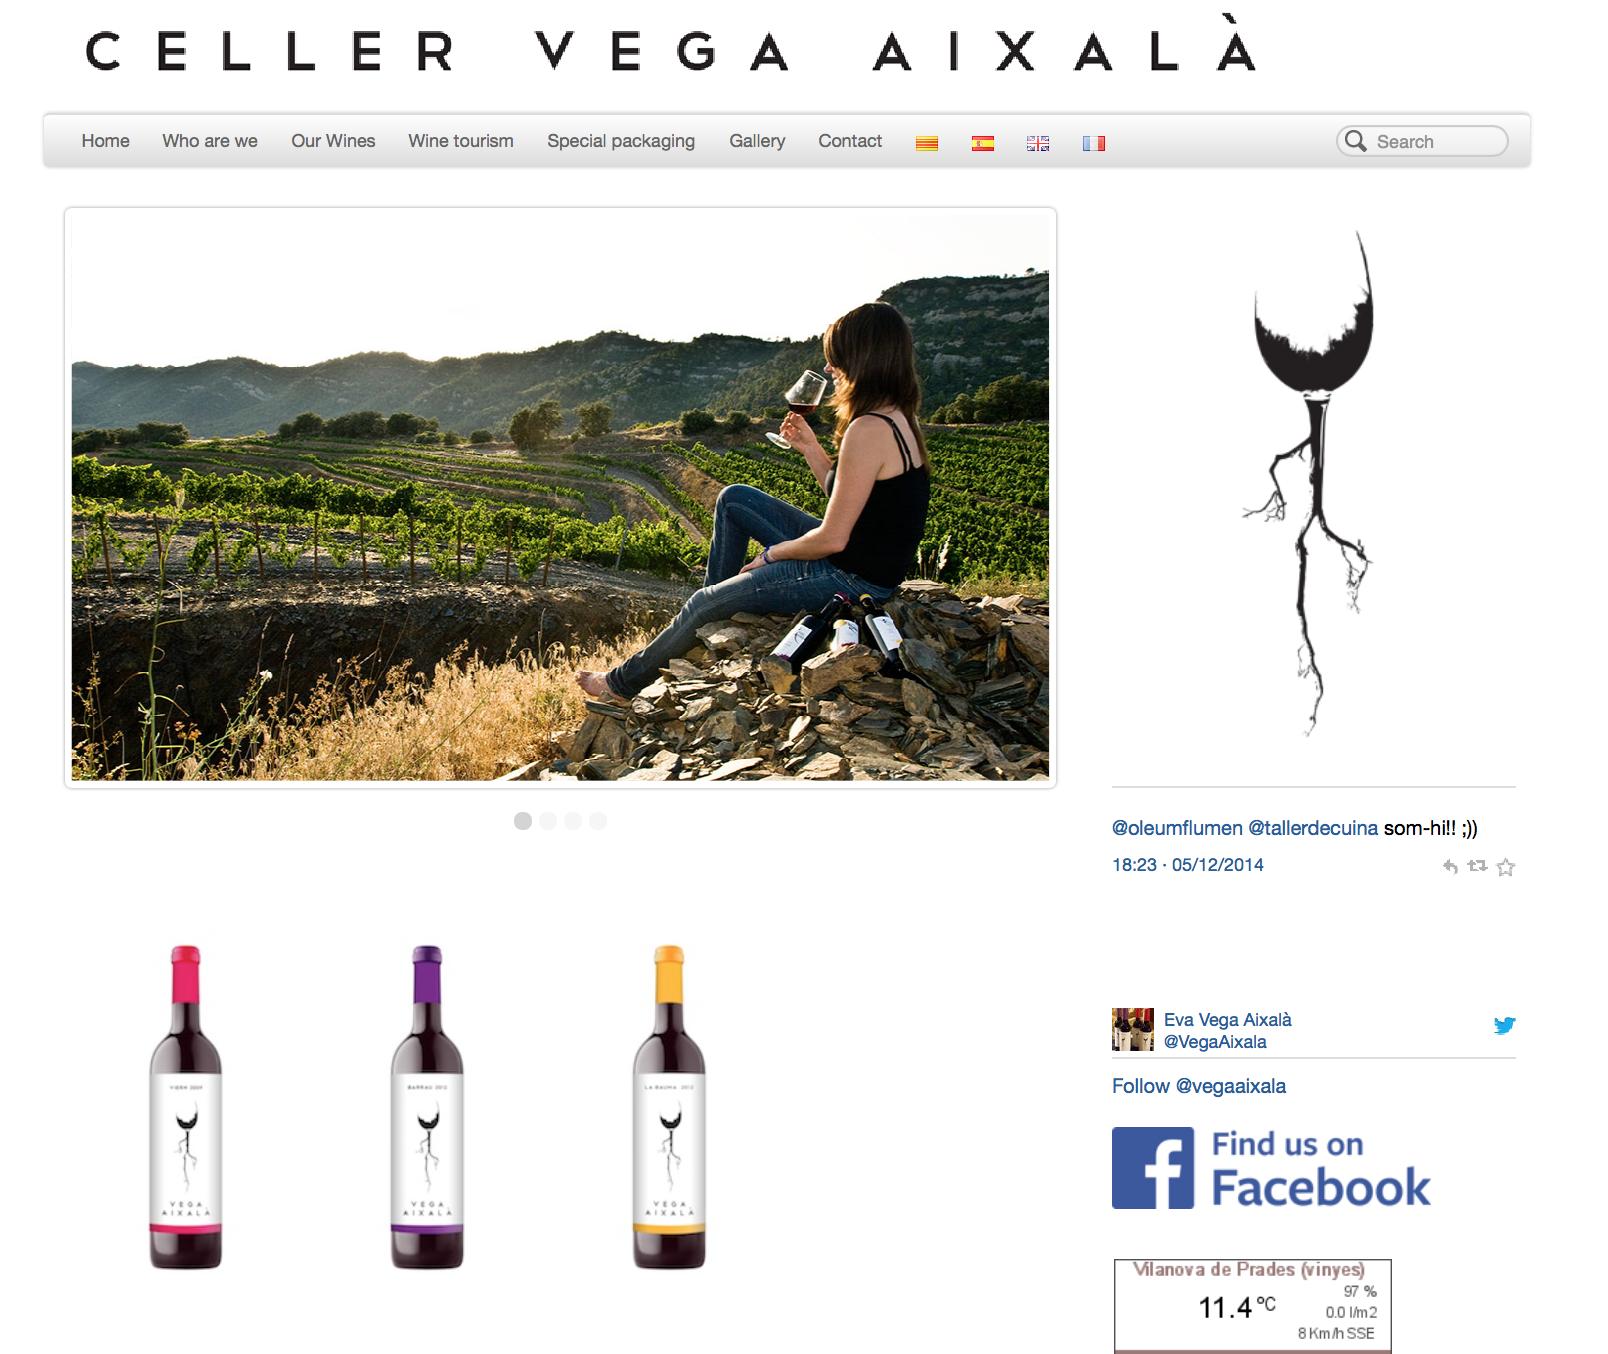 VegaAixala.com